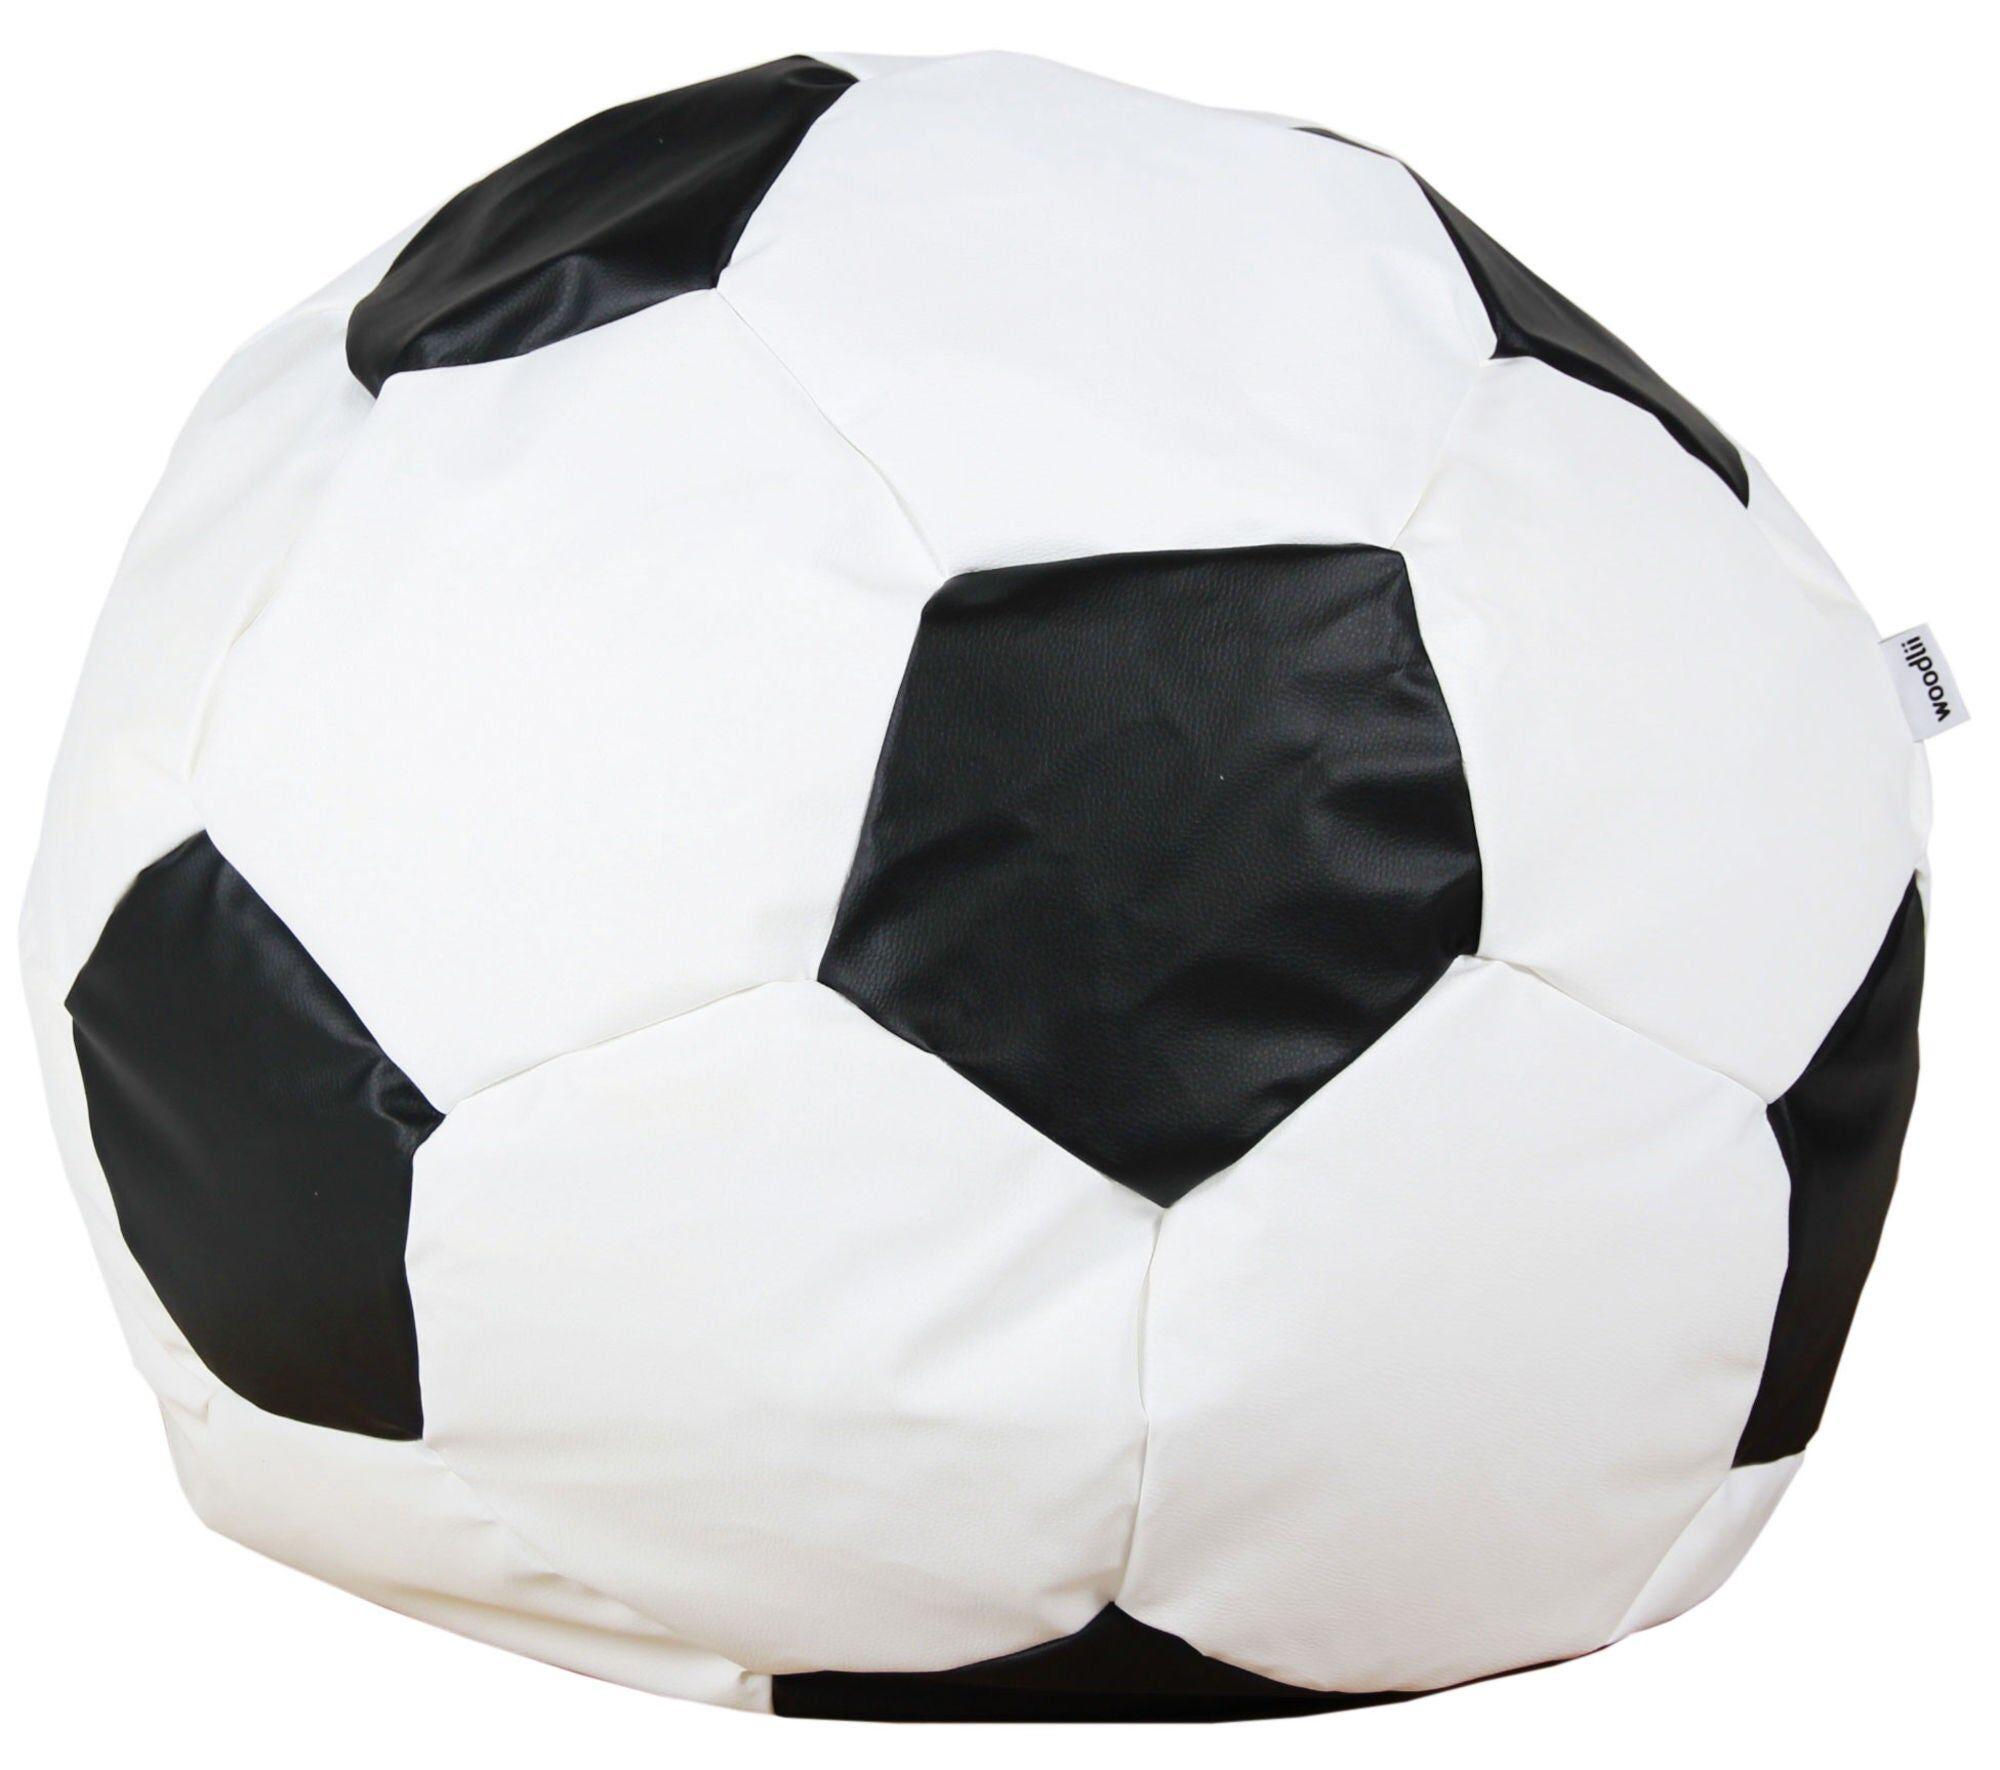 Woodlii Saccosekk Fotball, Large